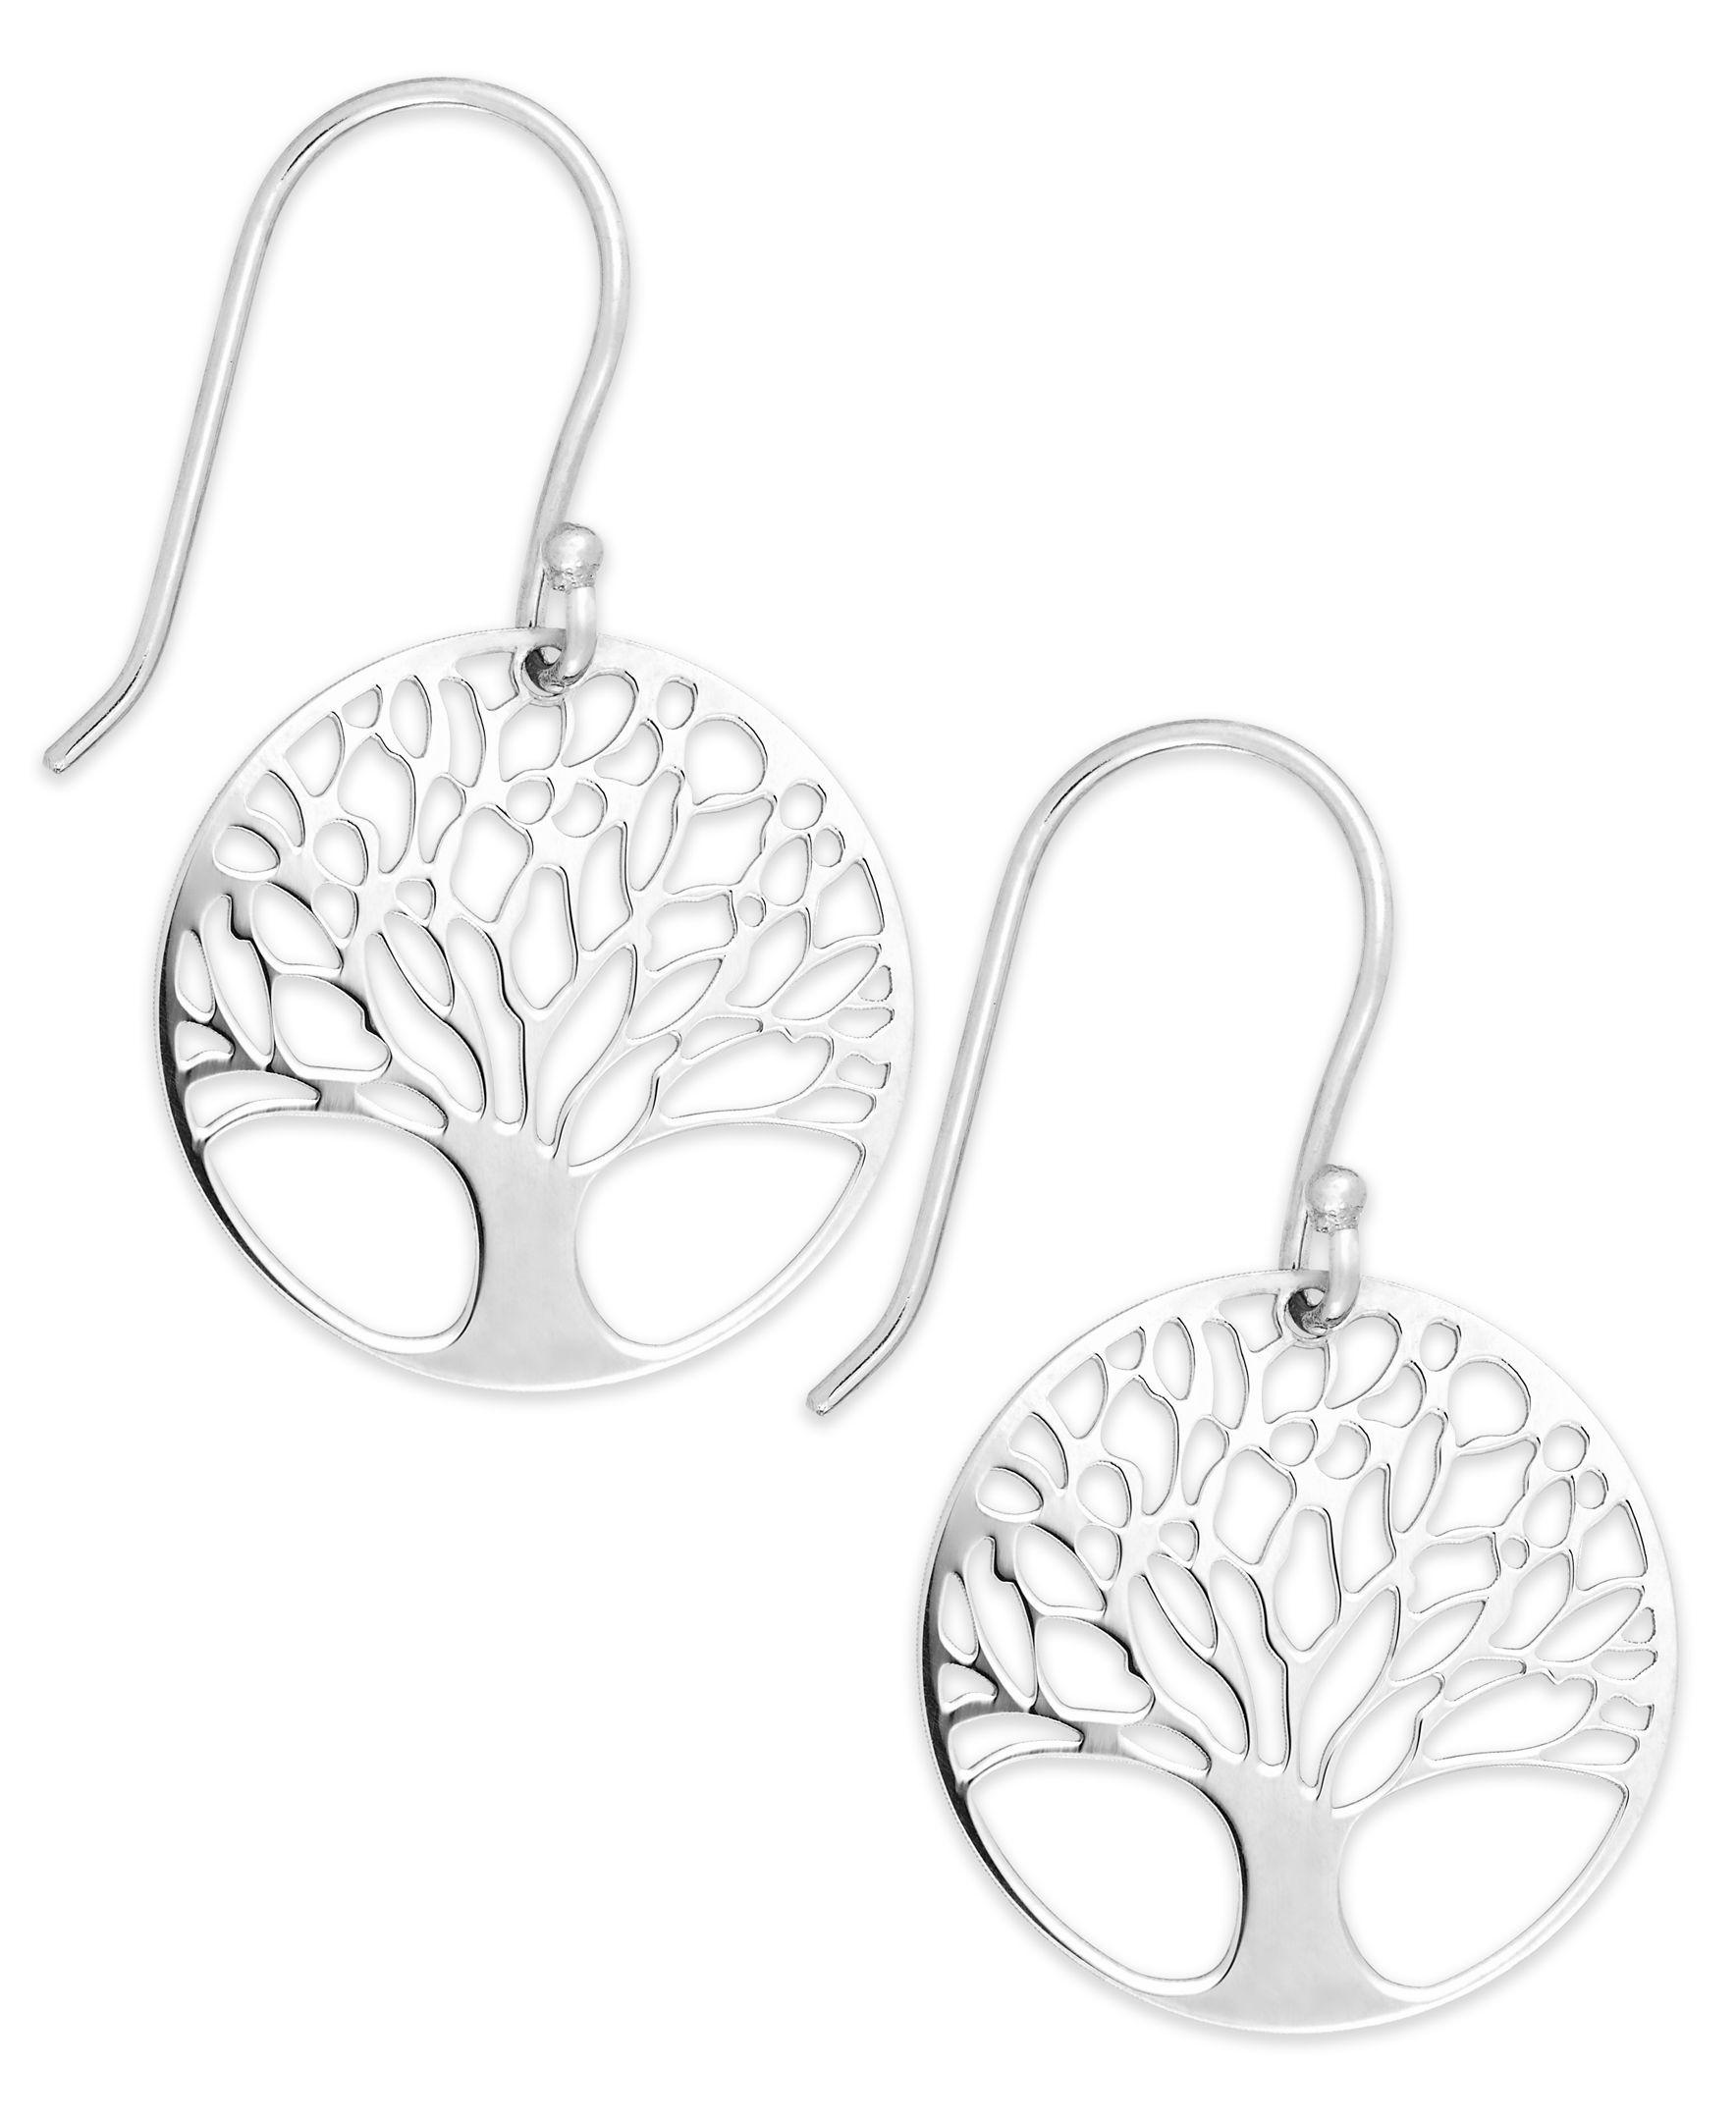 83908292c5 Giani Bernini Sterling Silver Tree of Life Drop Earrings | Products ...